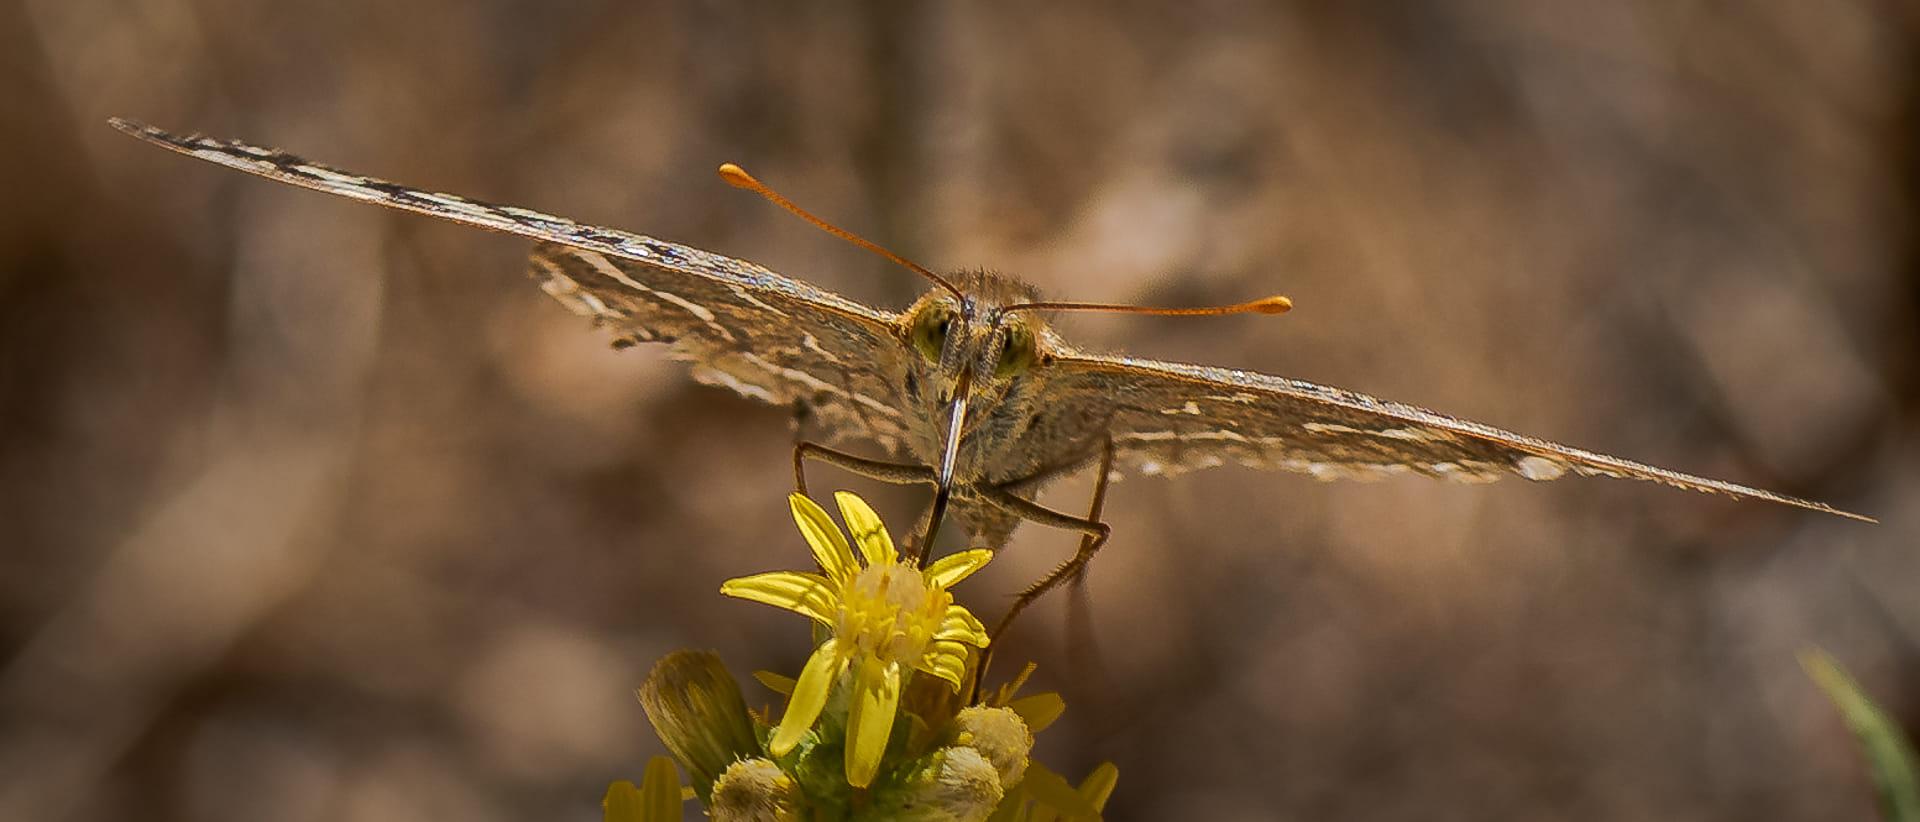 Mariposa en  su Hábitat